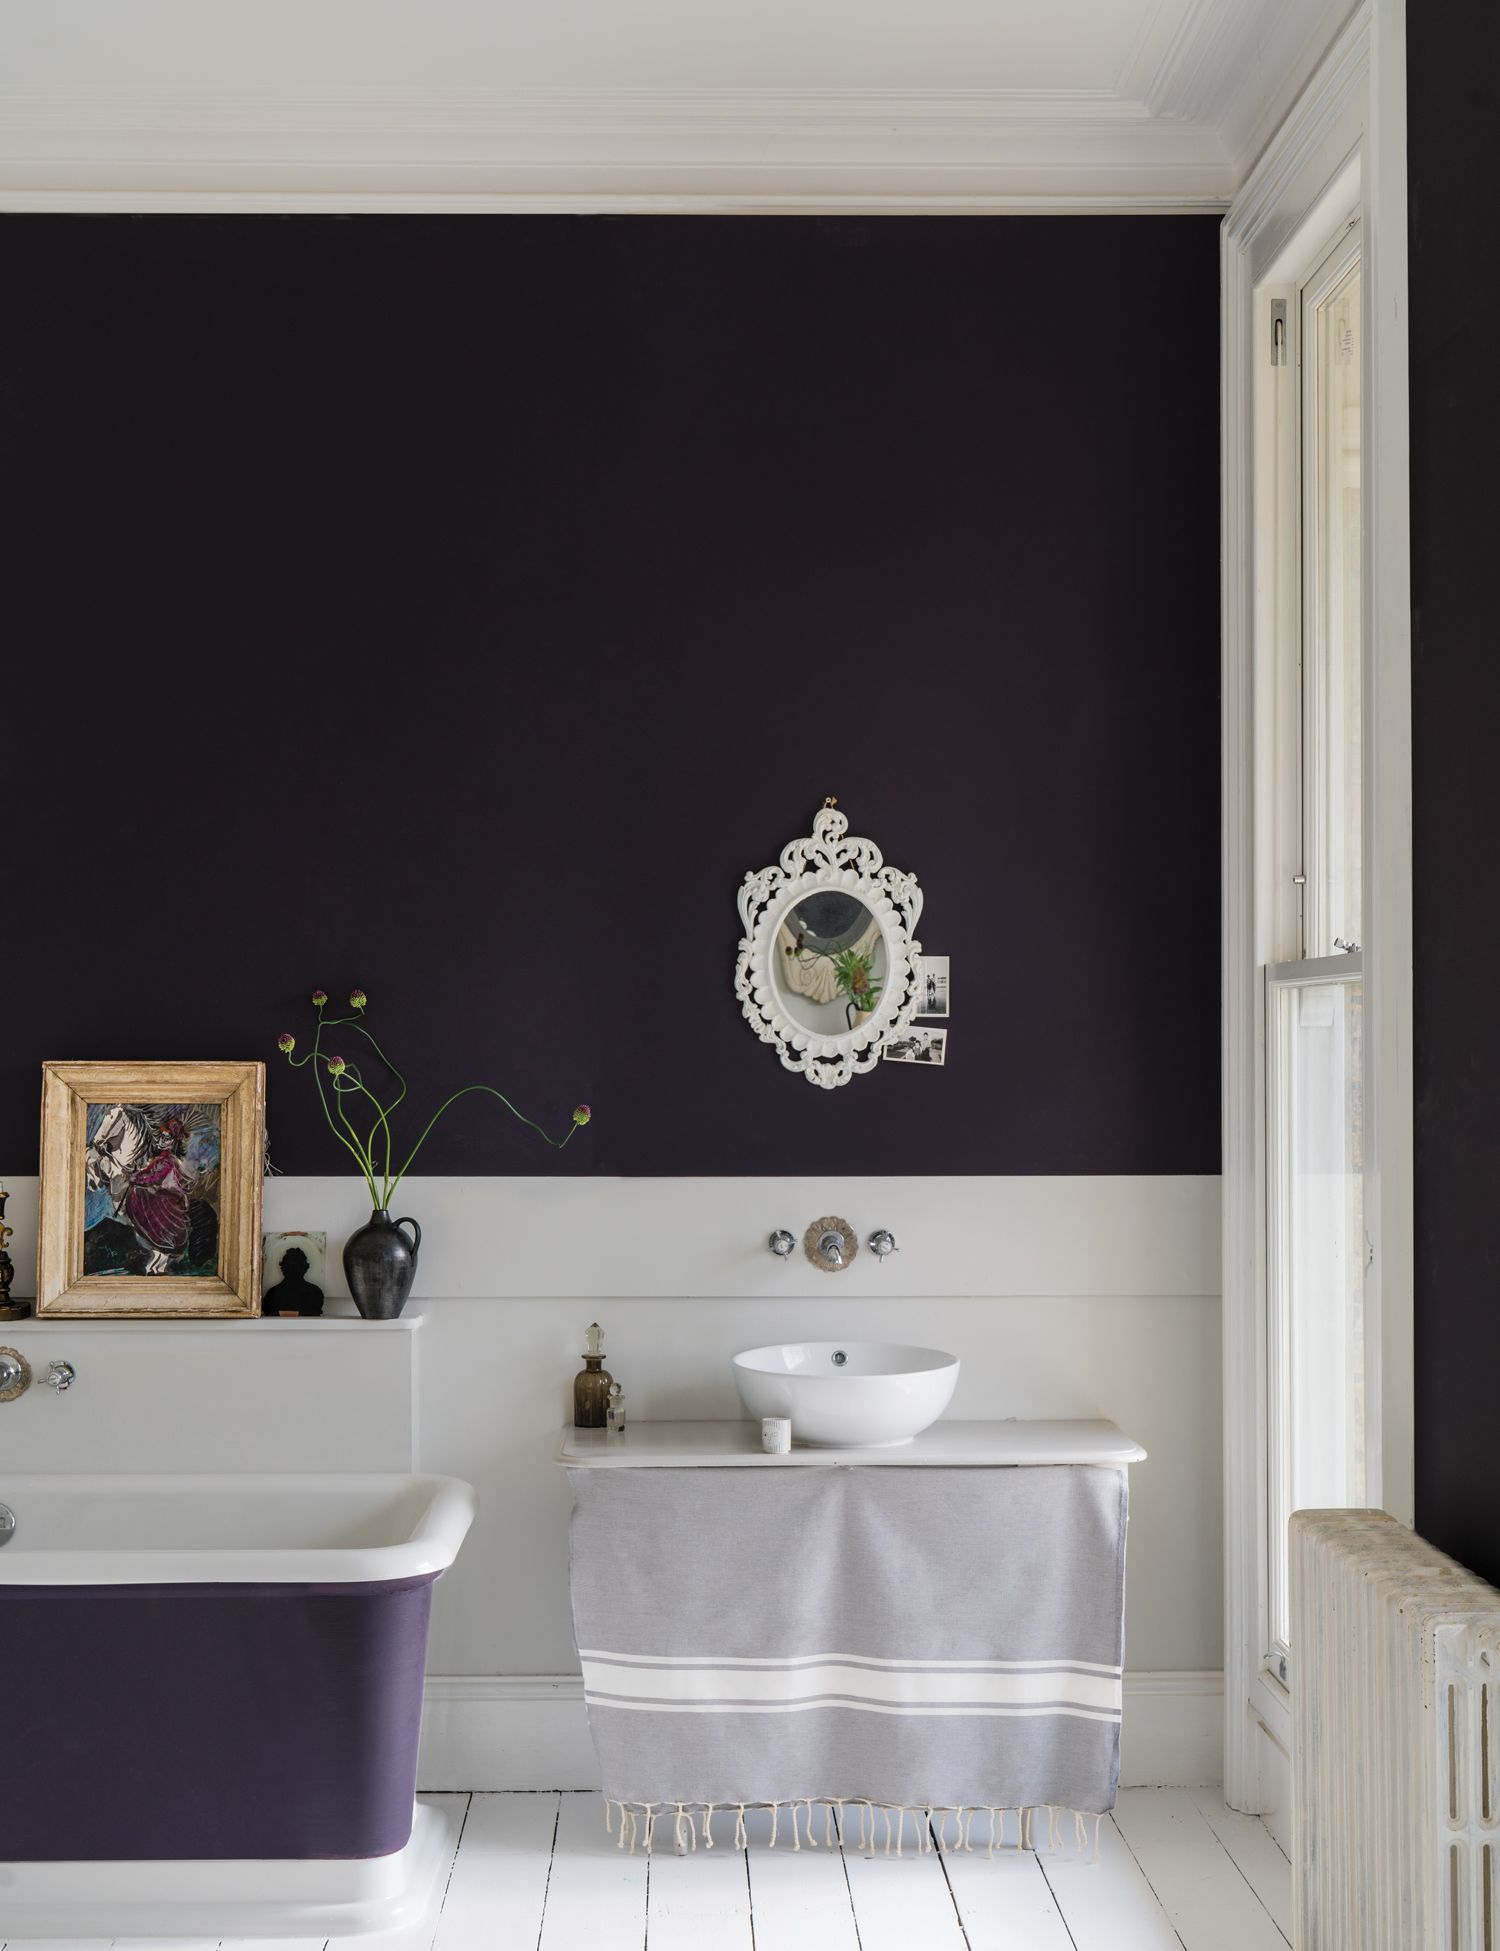 New Colors By Farrow Ball Decor8 Farrow Ball New Paint Colors Traditional Bathroom Designs